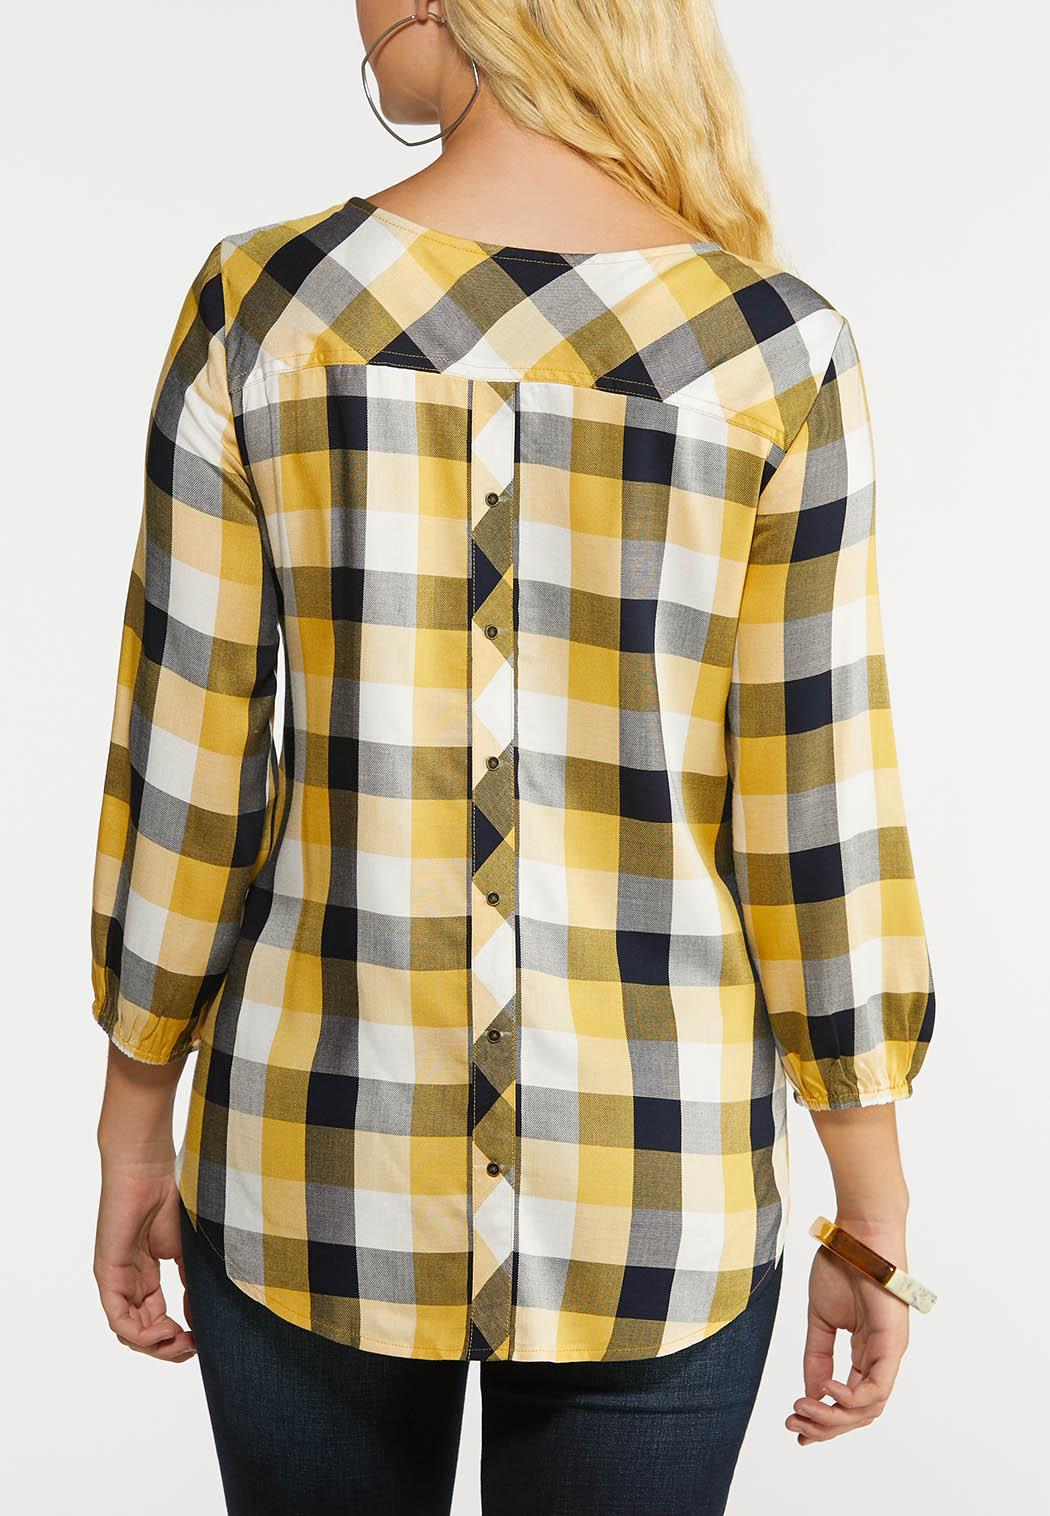 Plus Size Gold And Black Plaid Shirt (Item #43999780)